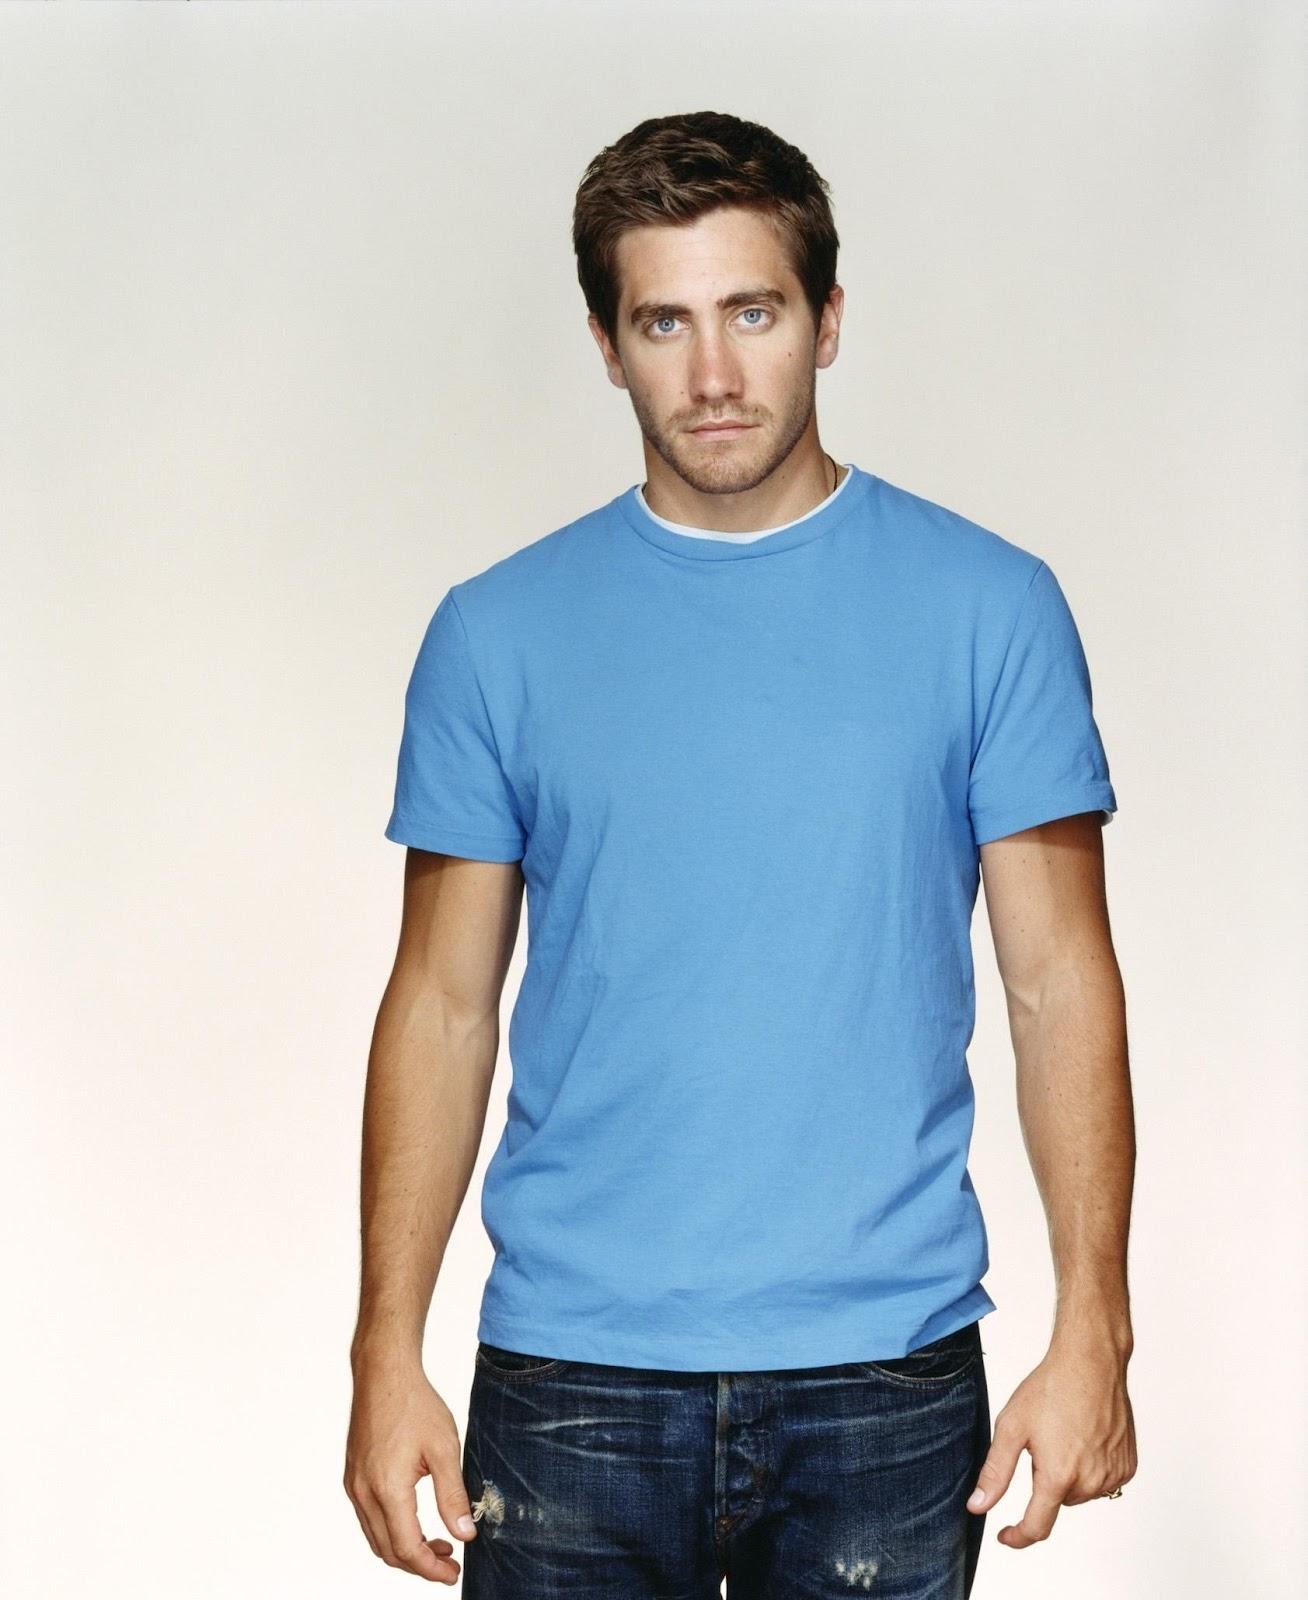 http://1.bp.blogspot.com/-bn_D2RYEnUY/T9VDL9jlm2I/AAAAAAAABSY/pnkQhUfCDeE/s1600/jake-gyllenhaal-picture-hot-sexy.jpg